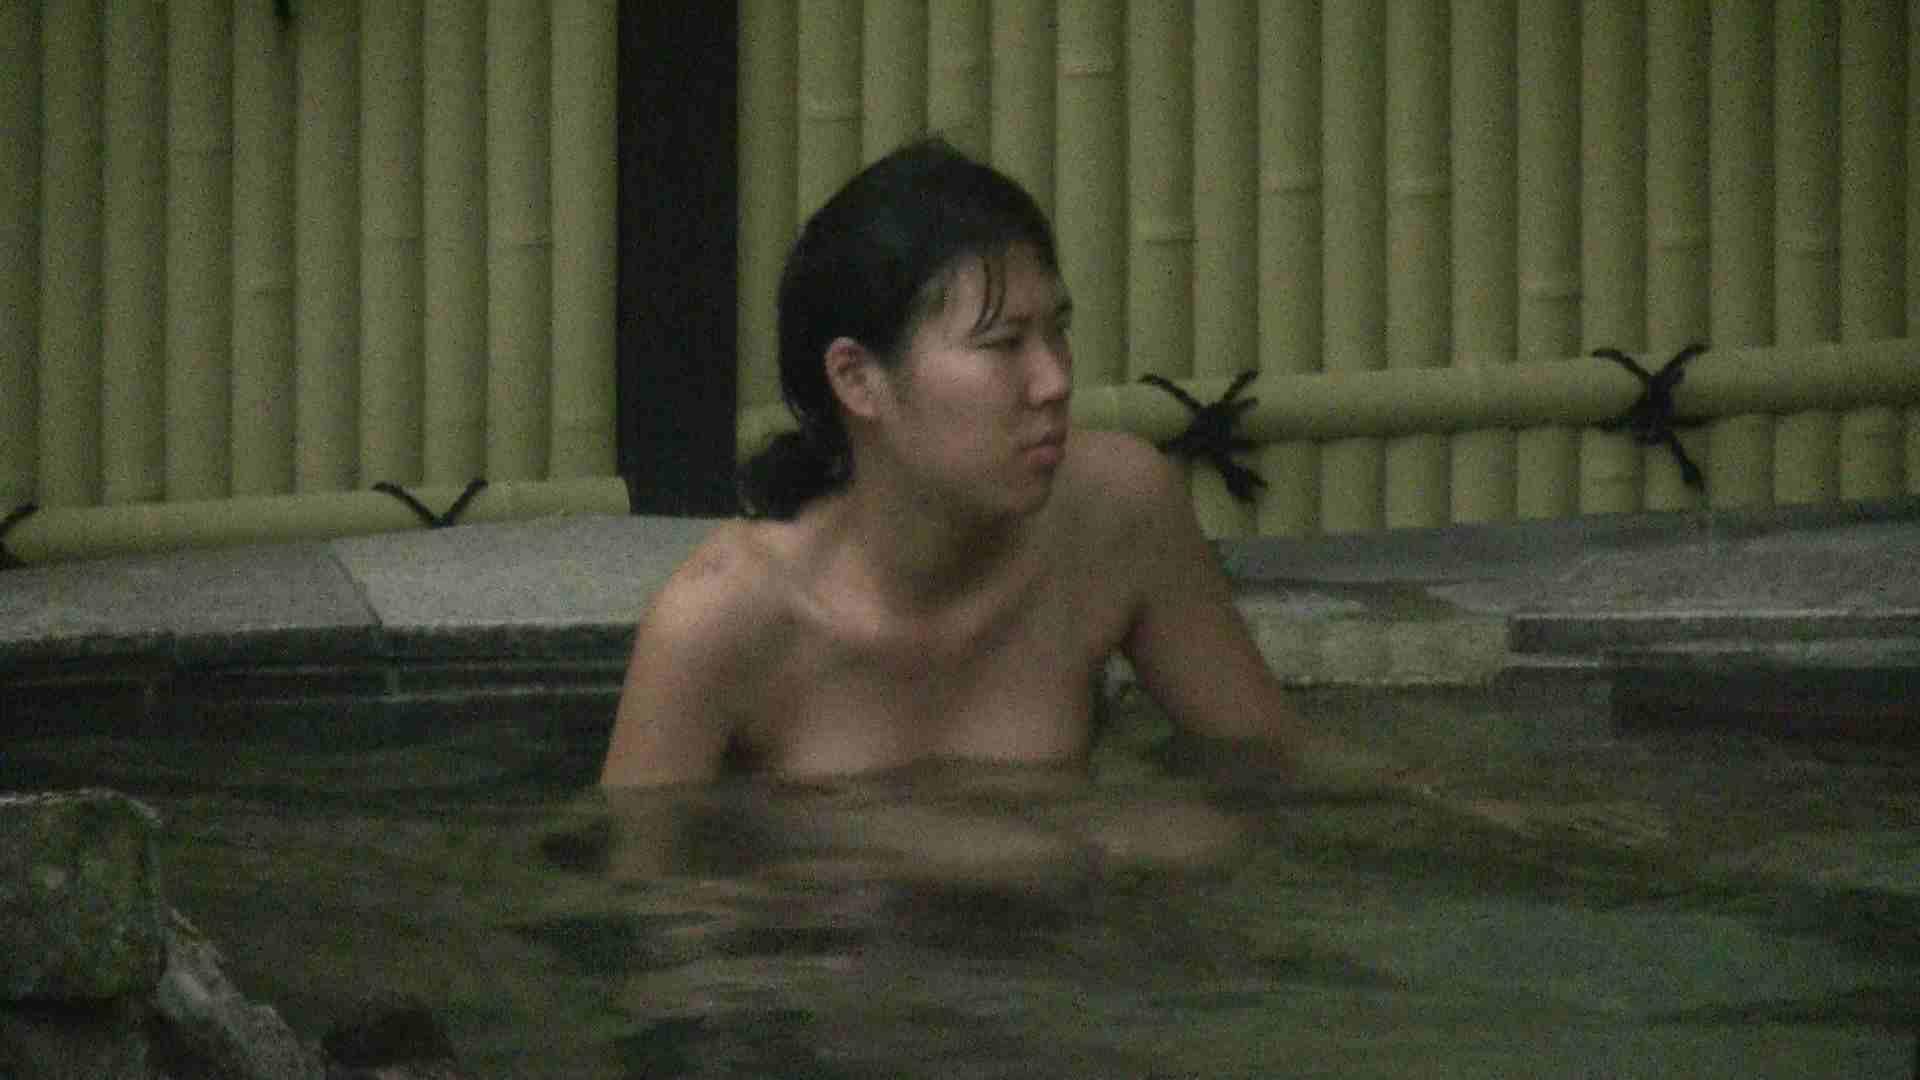 Aquaな露天風呂Vol.215 綺麗なOLたち  106枚 63